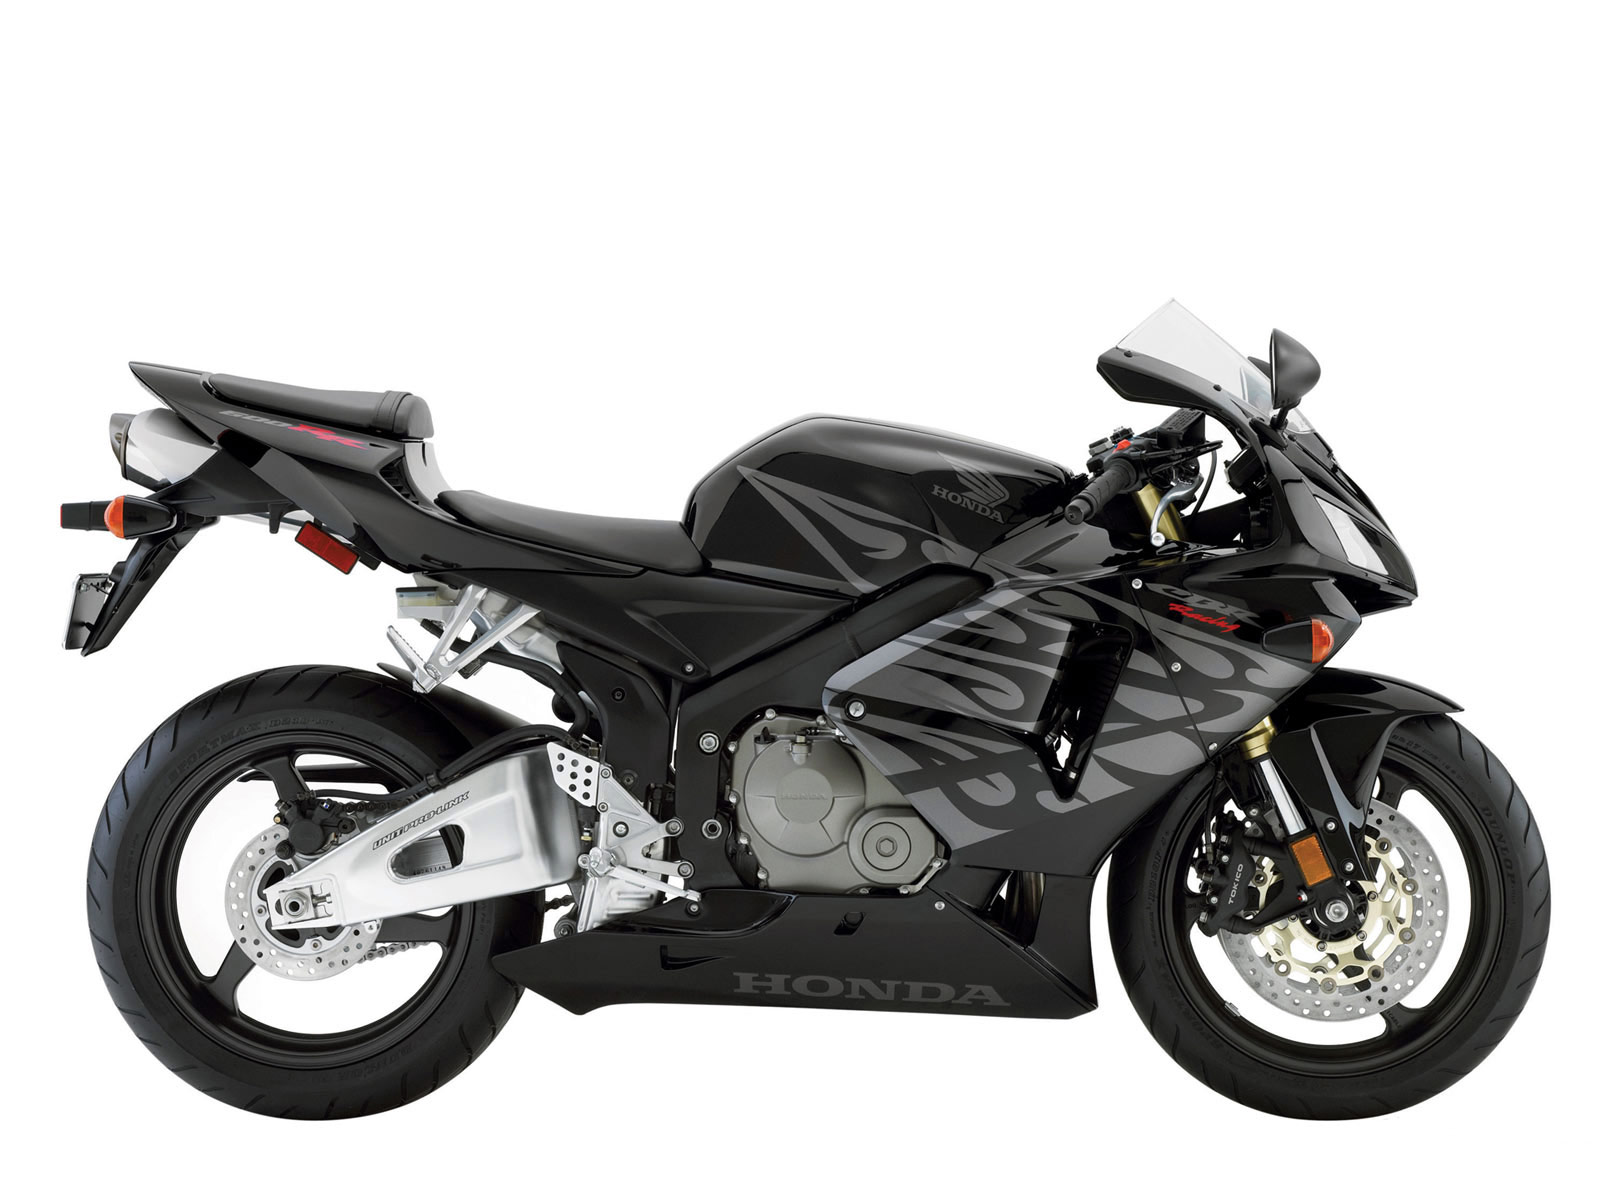 Запчасти для мотоцикла honda cbr 600